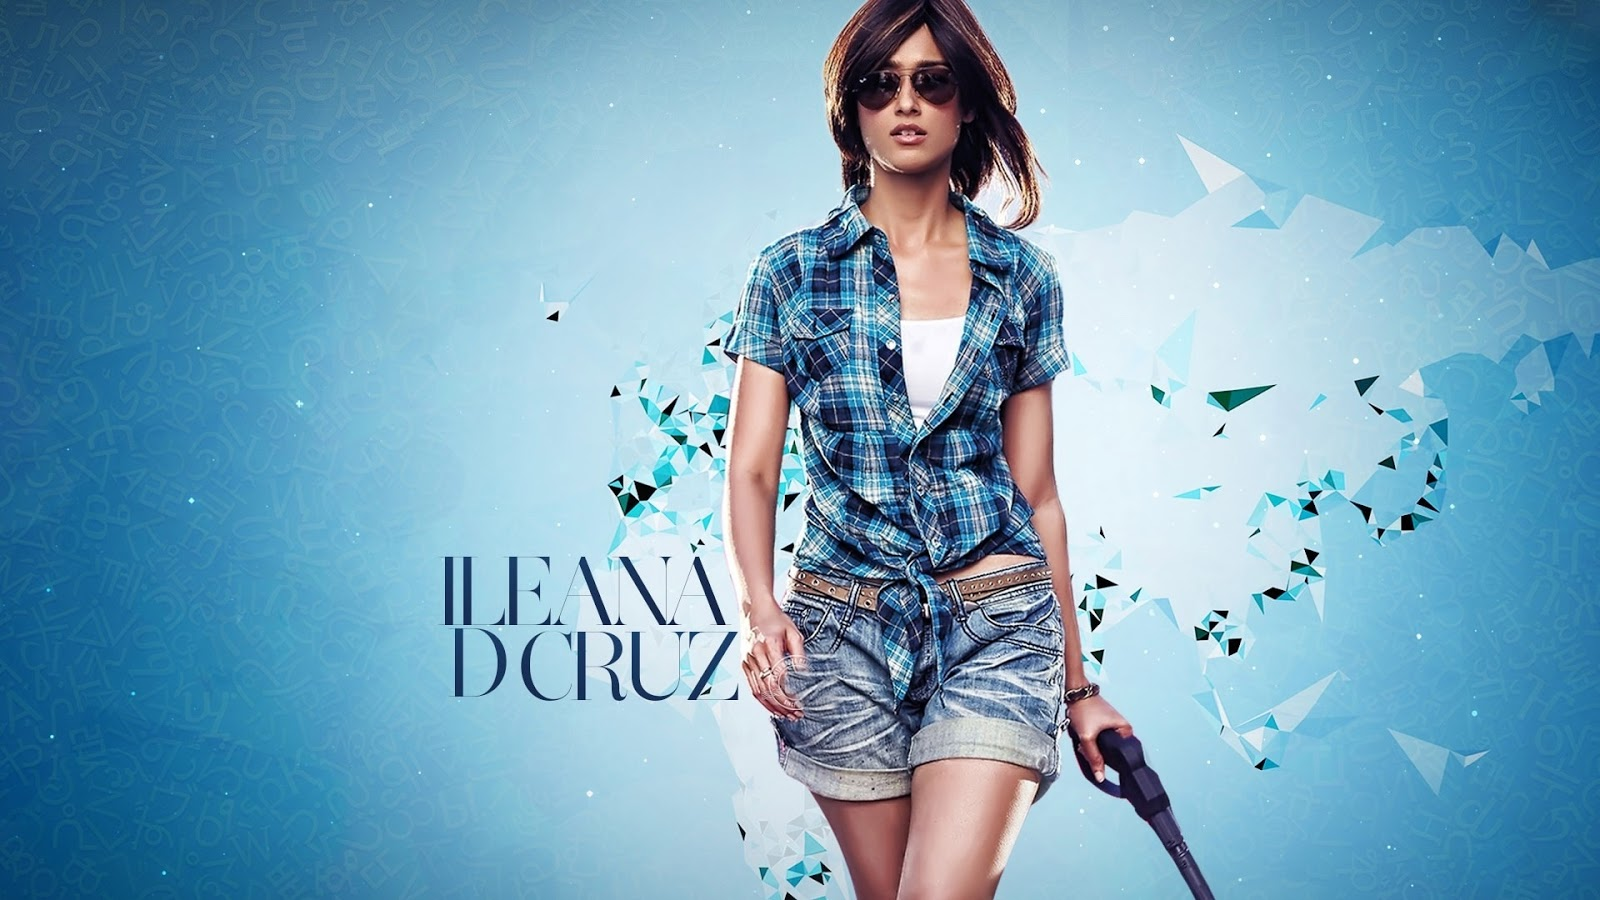 Ileana D'Cruz Hot HD Wallpaper